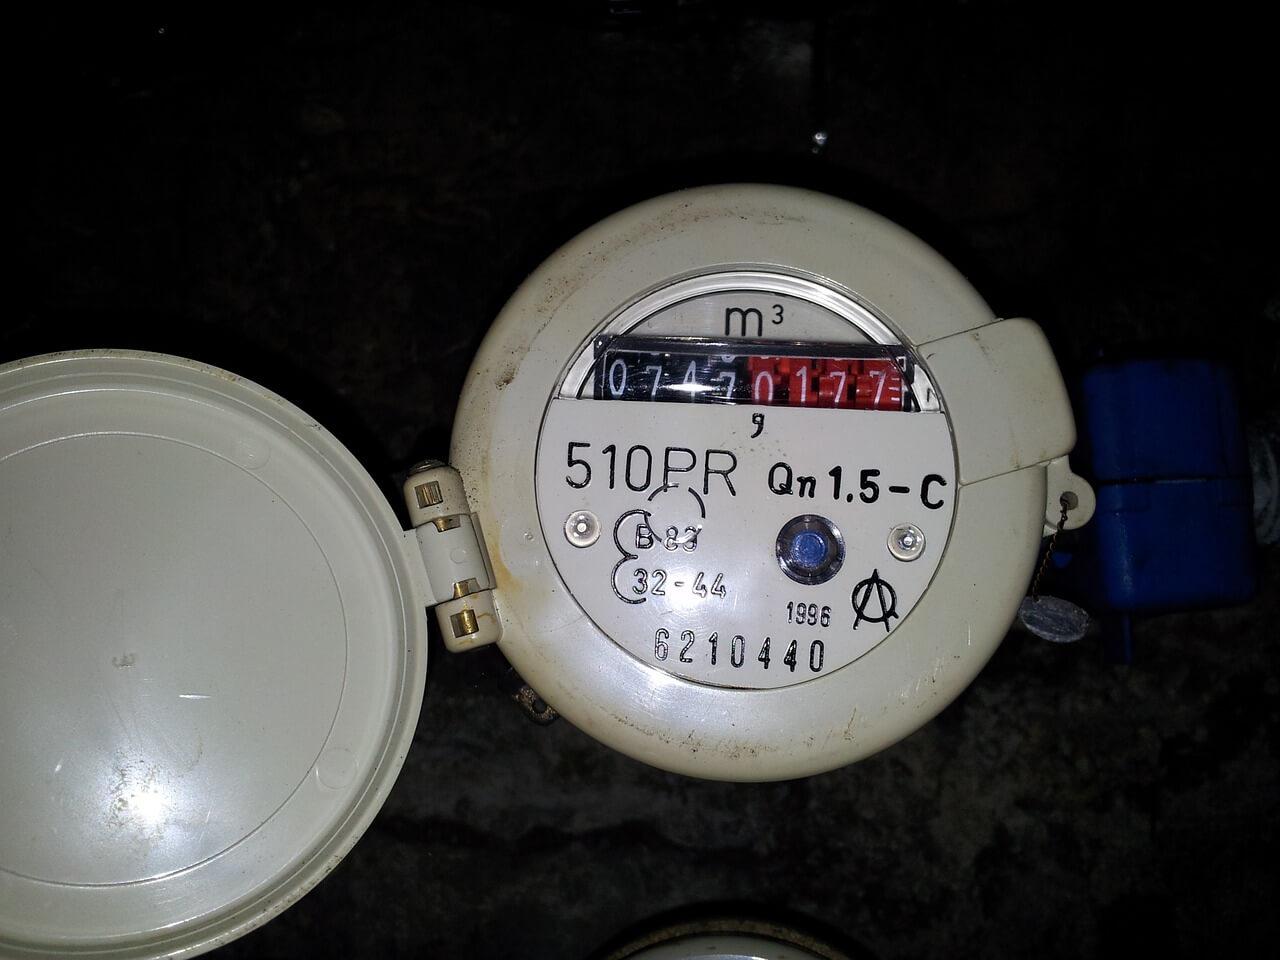 contador agua lectura remota